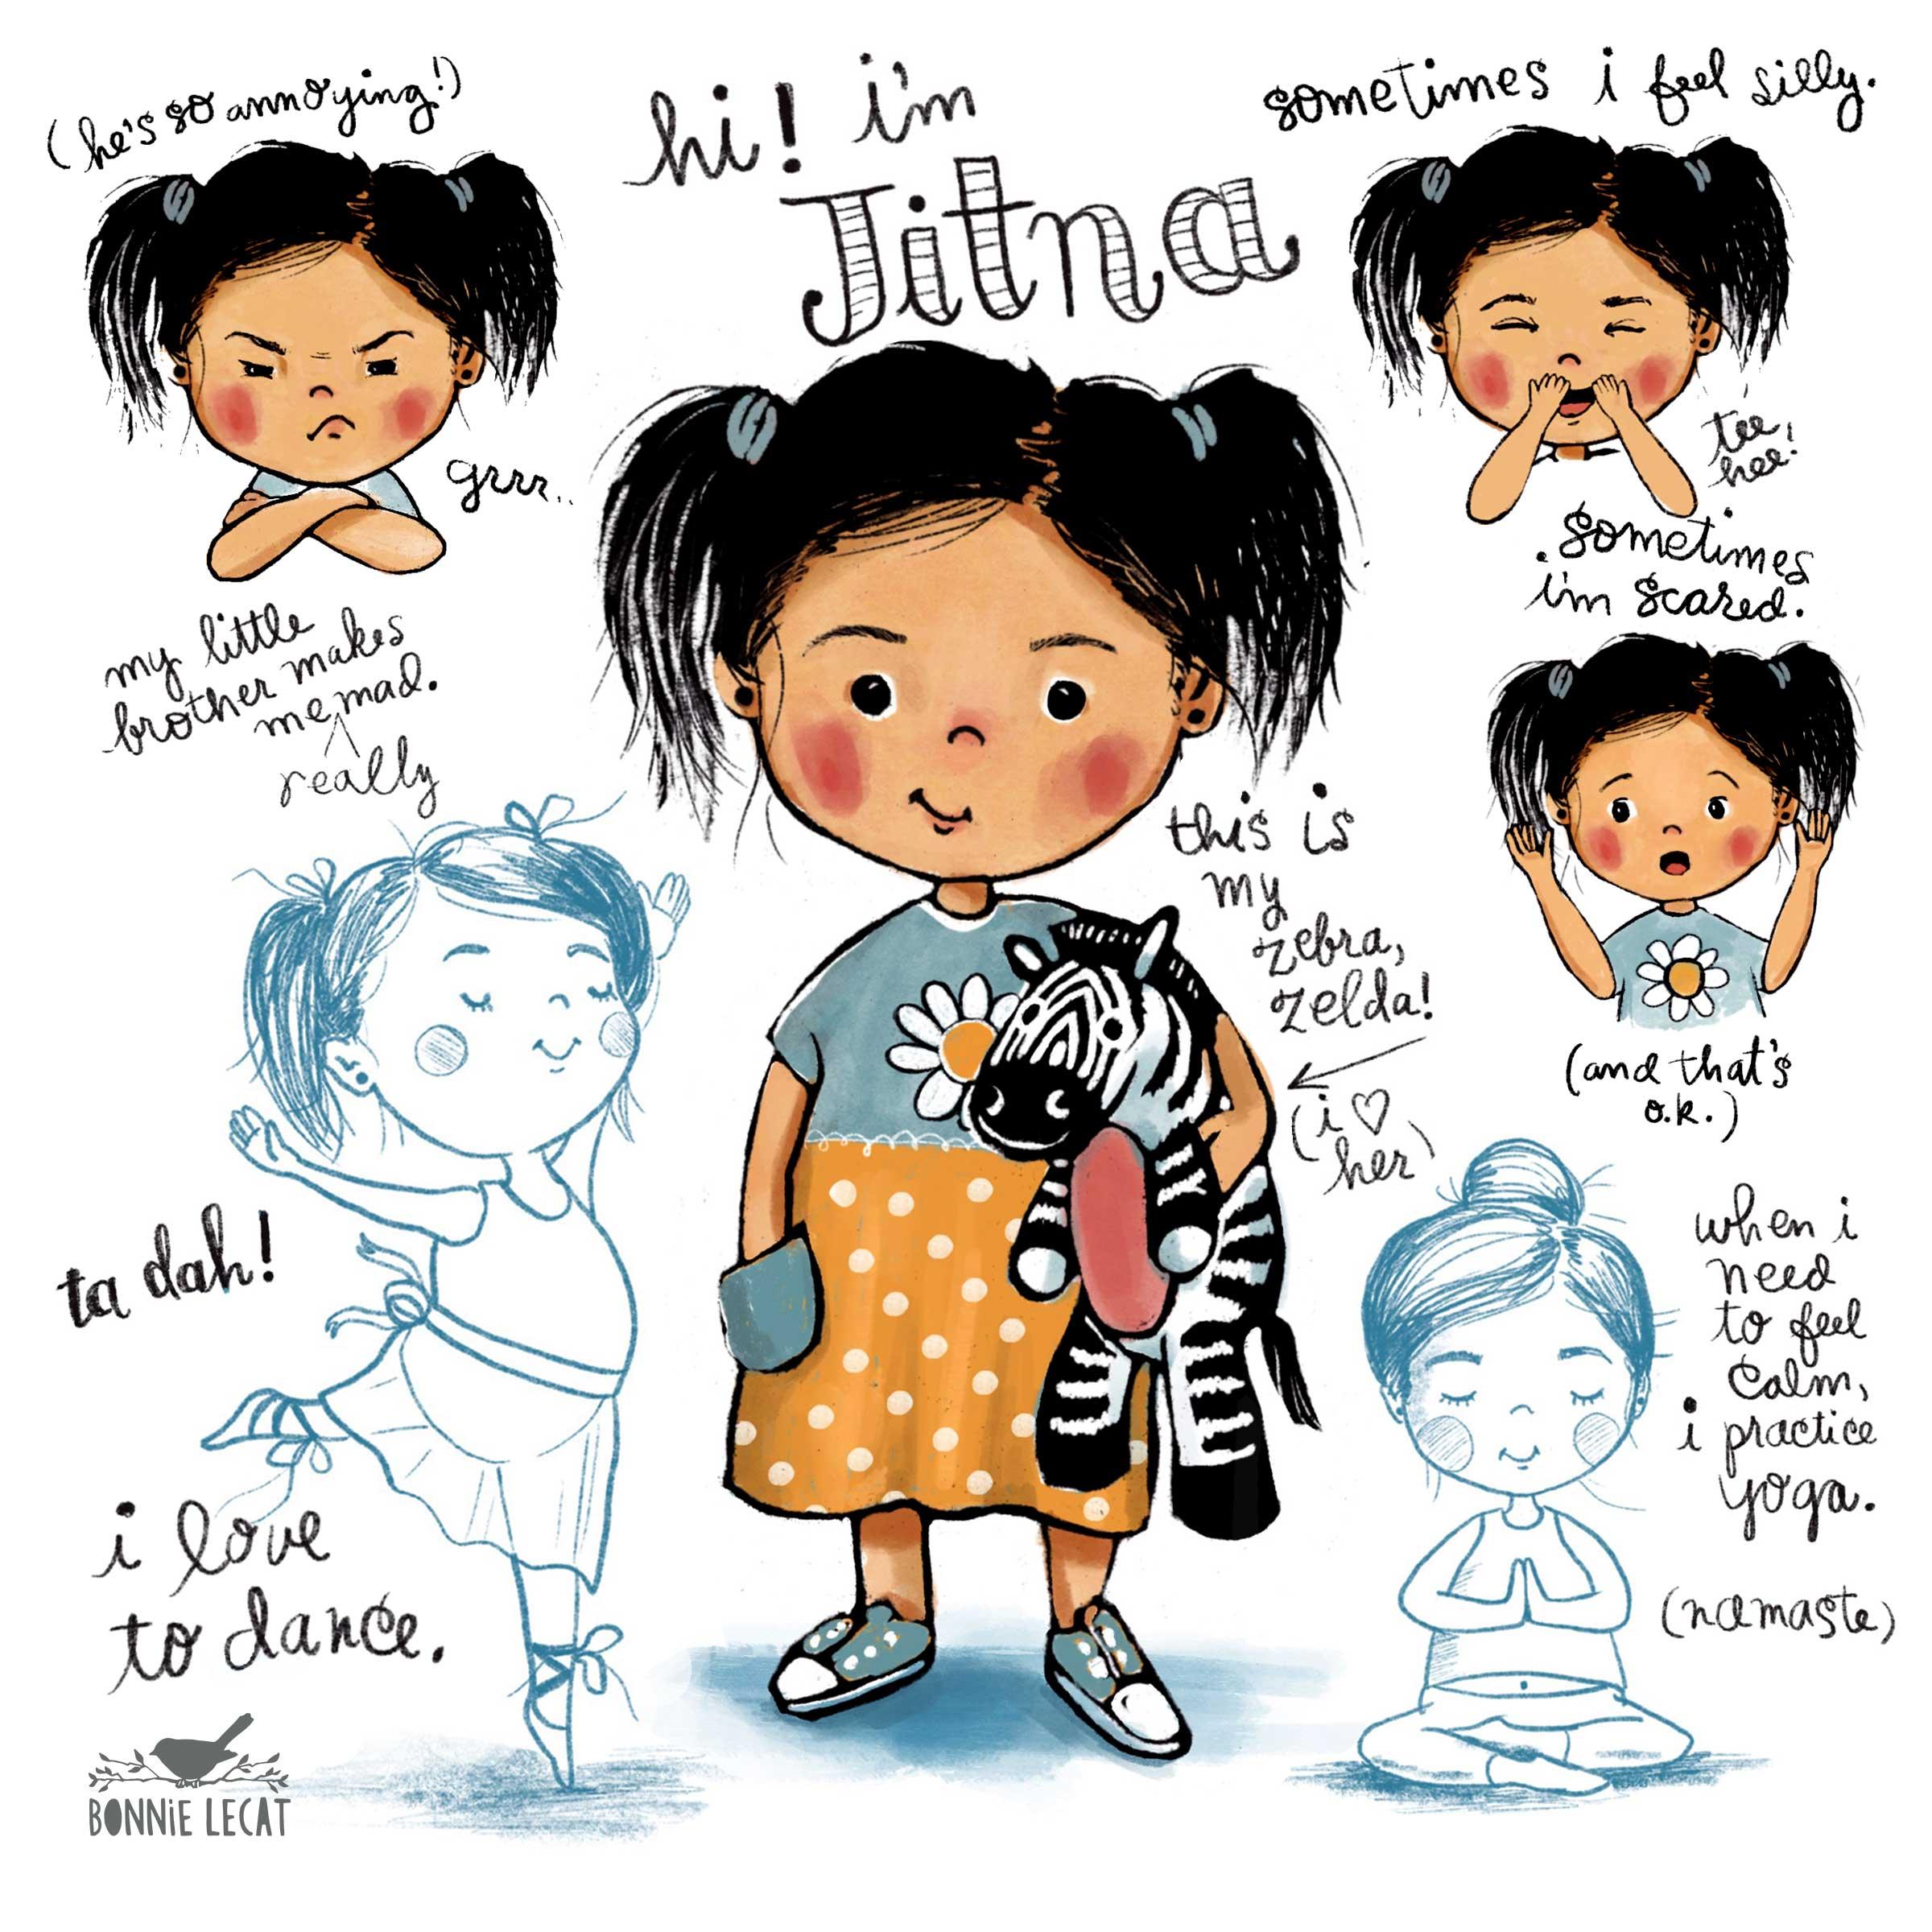 Character design by Bonnie Lecat.